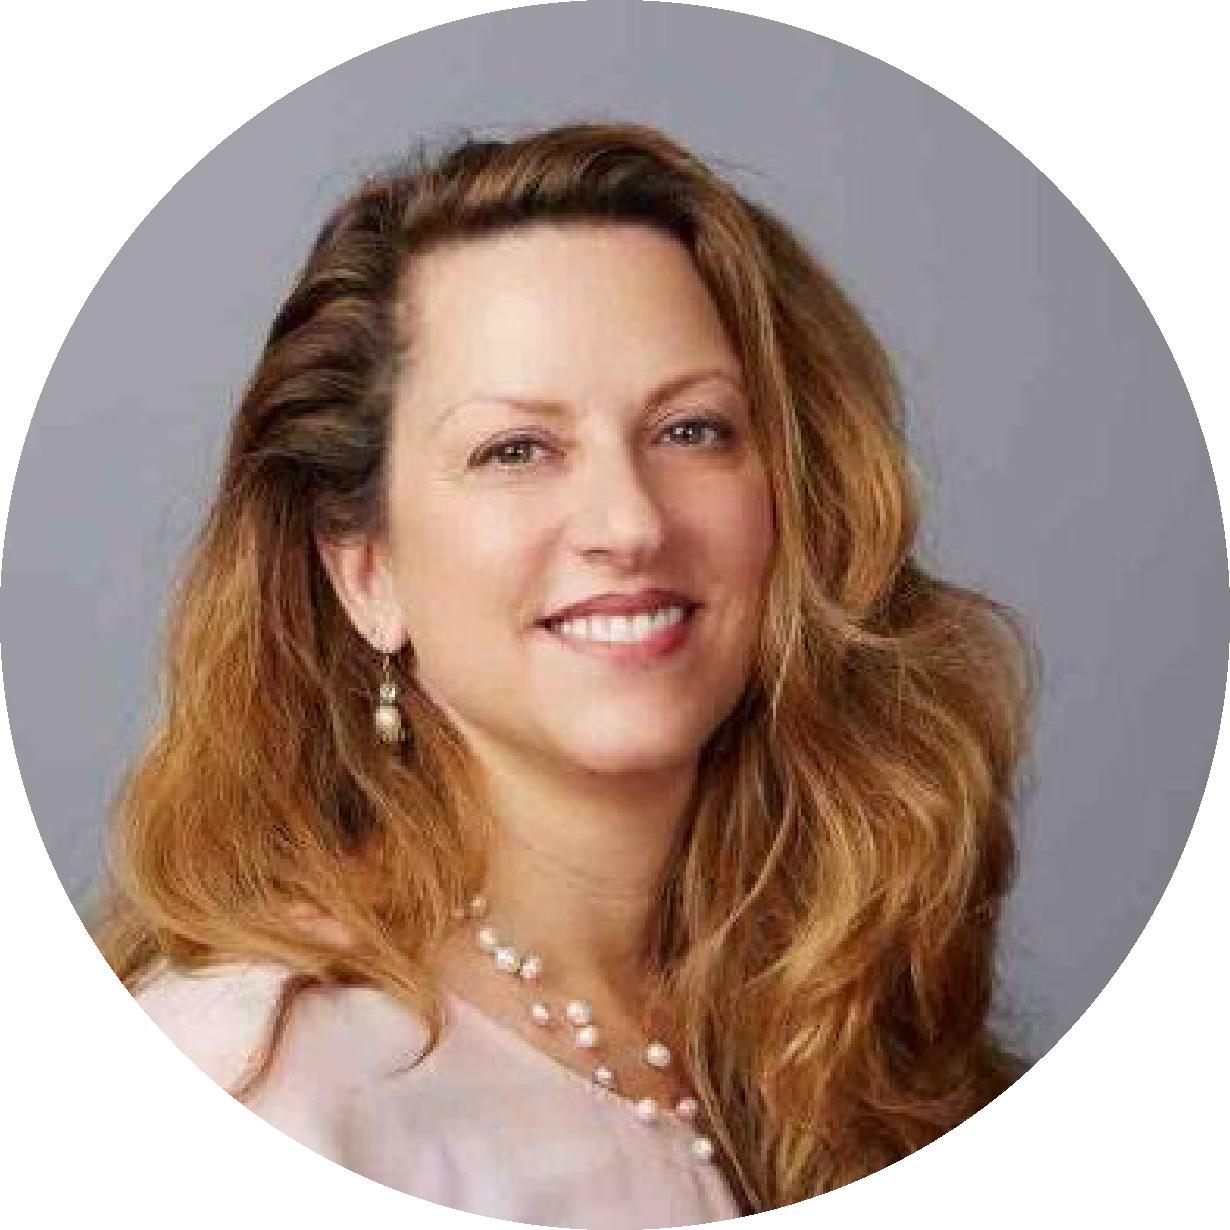 Melanie Graff, Speaker at Women Impact Tech